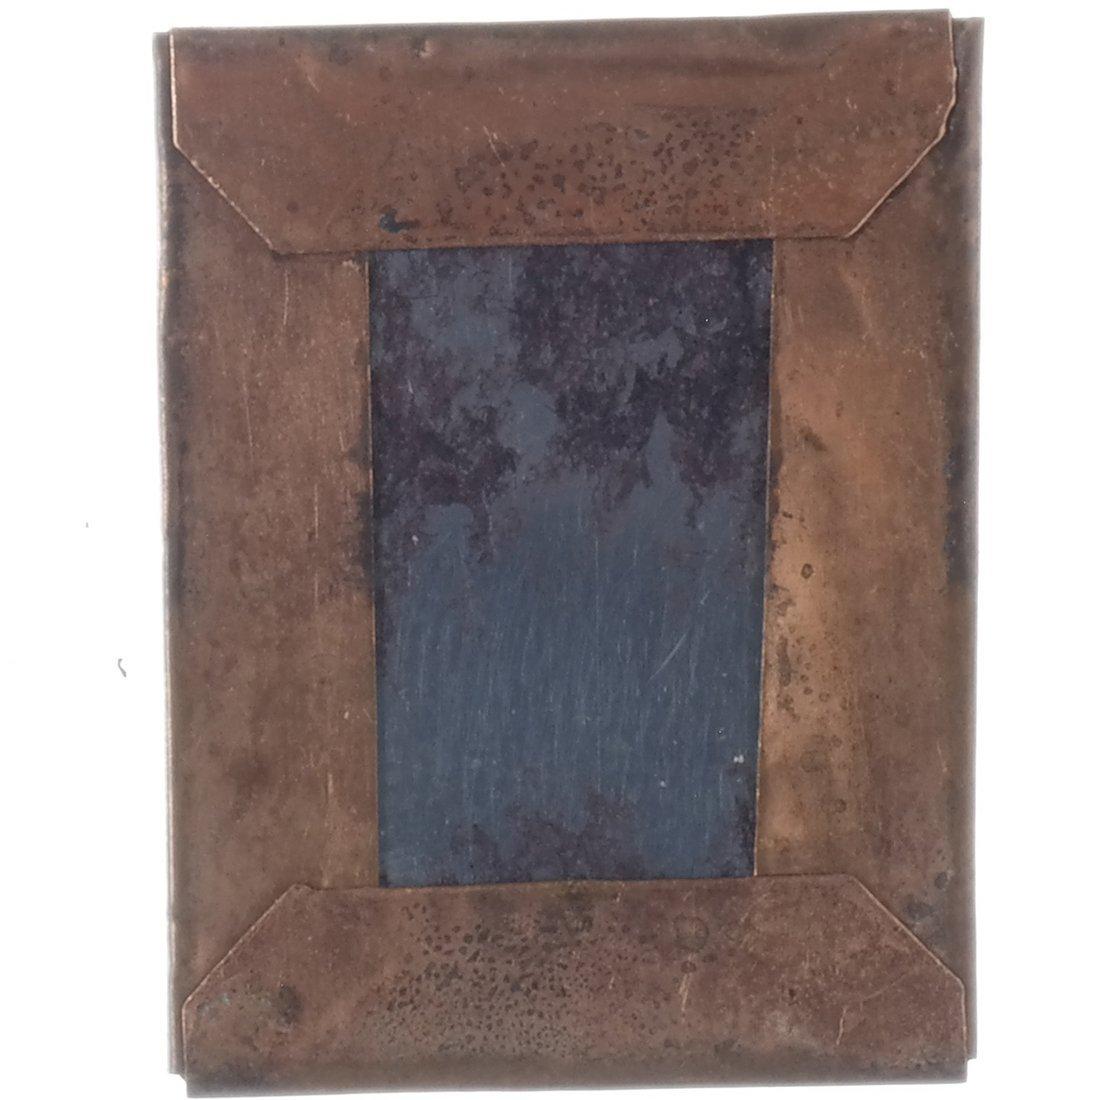 Grant & Wilson 1872 Jugate Albumen - 2